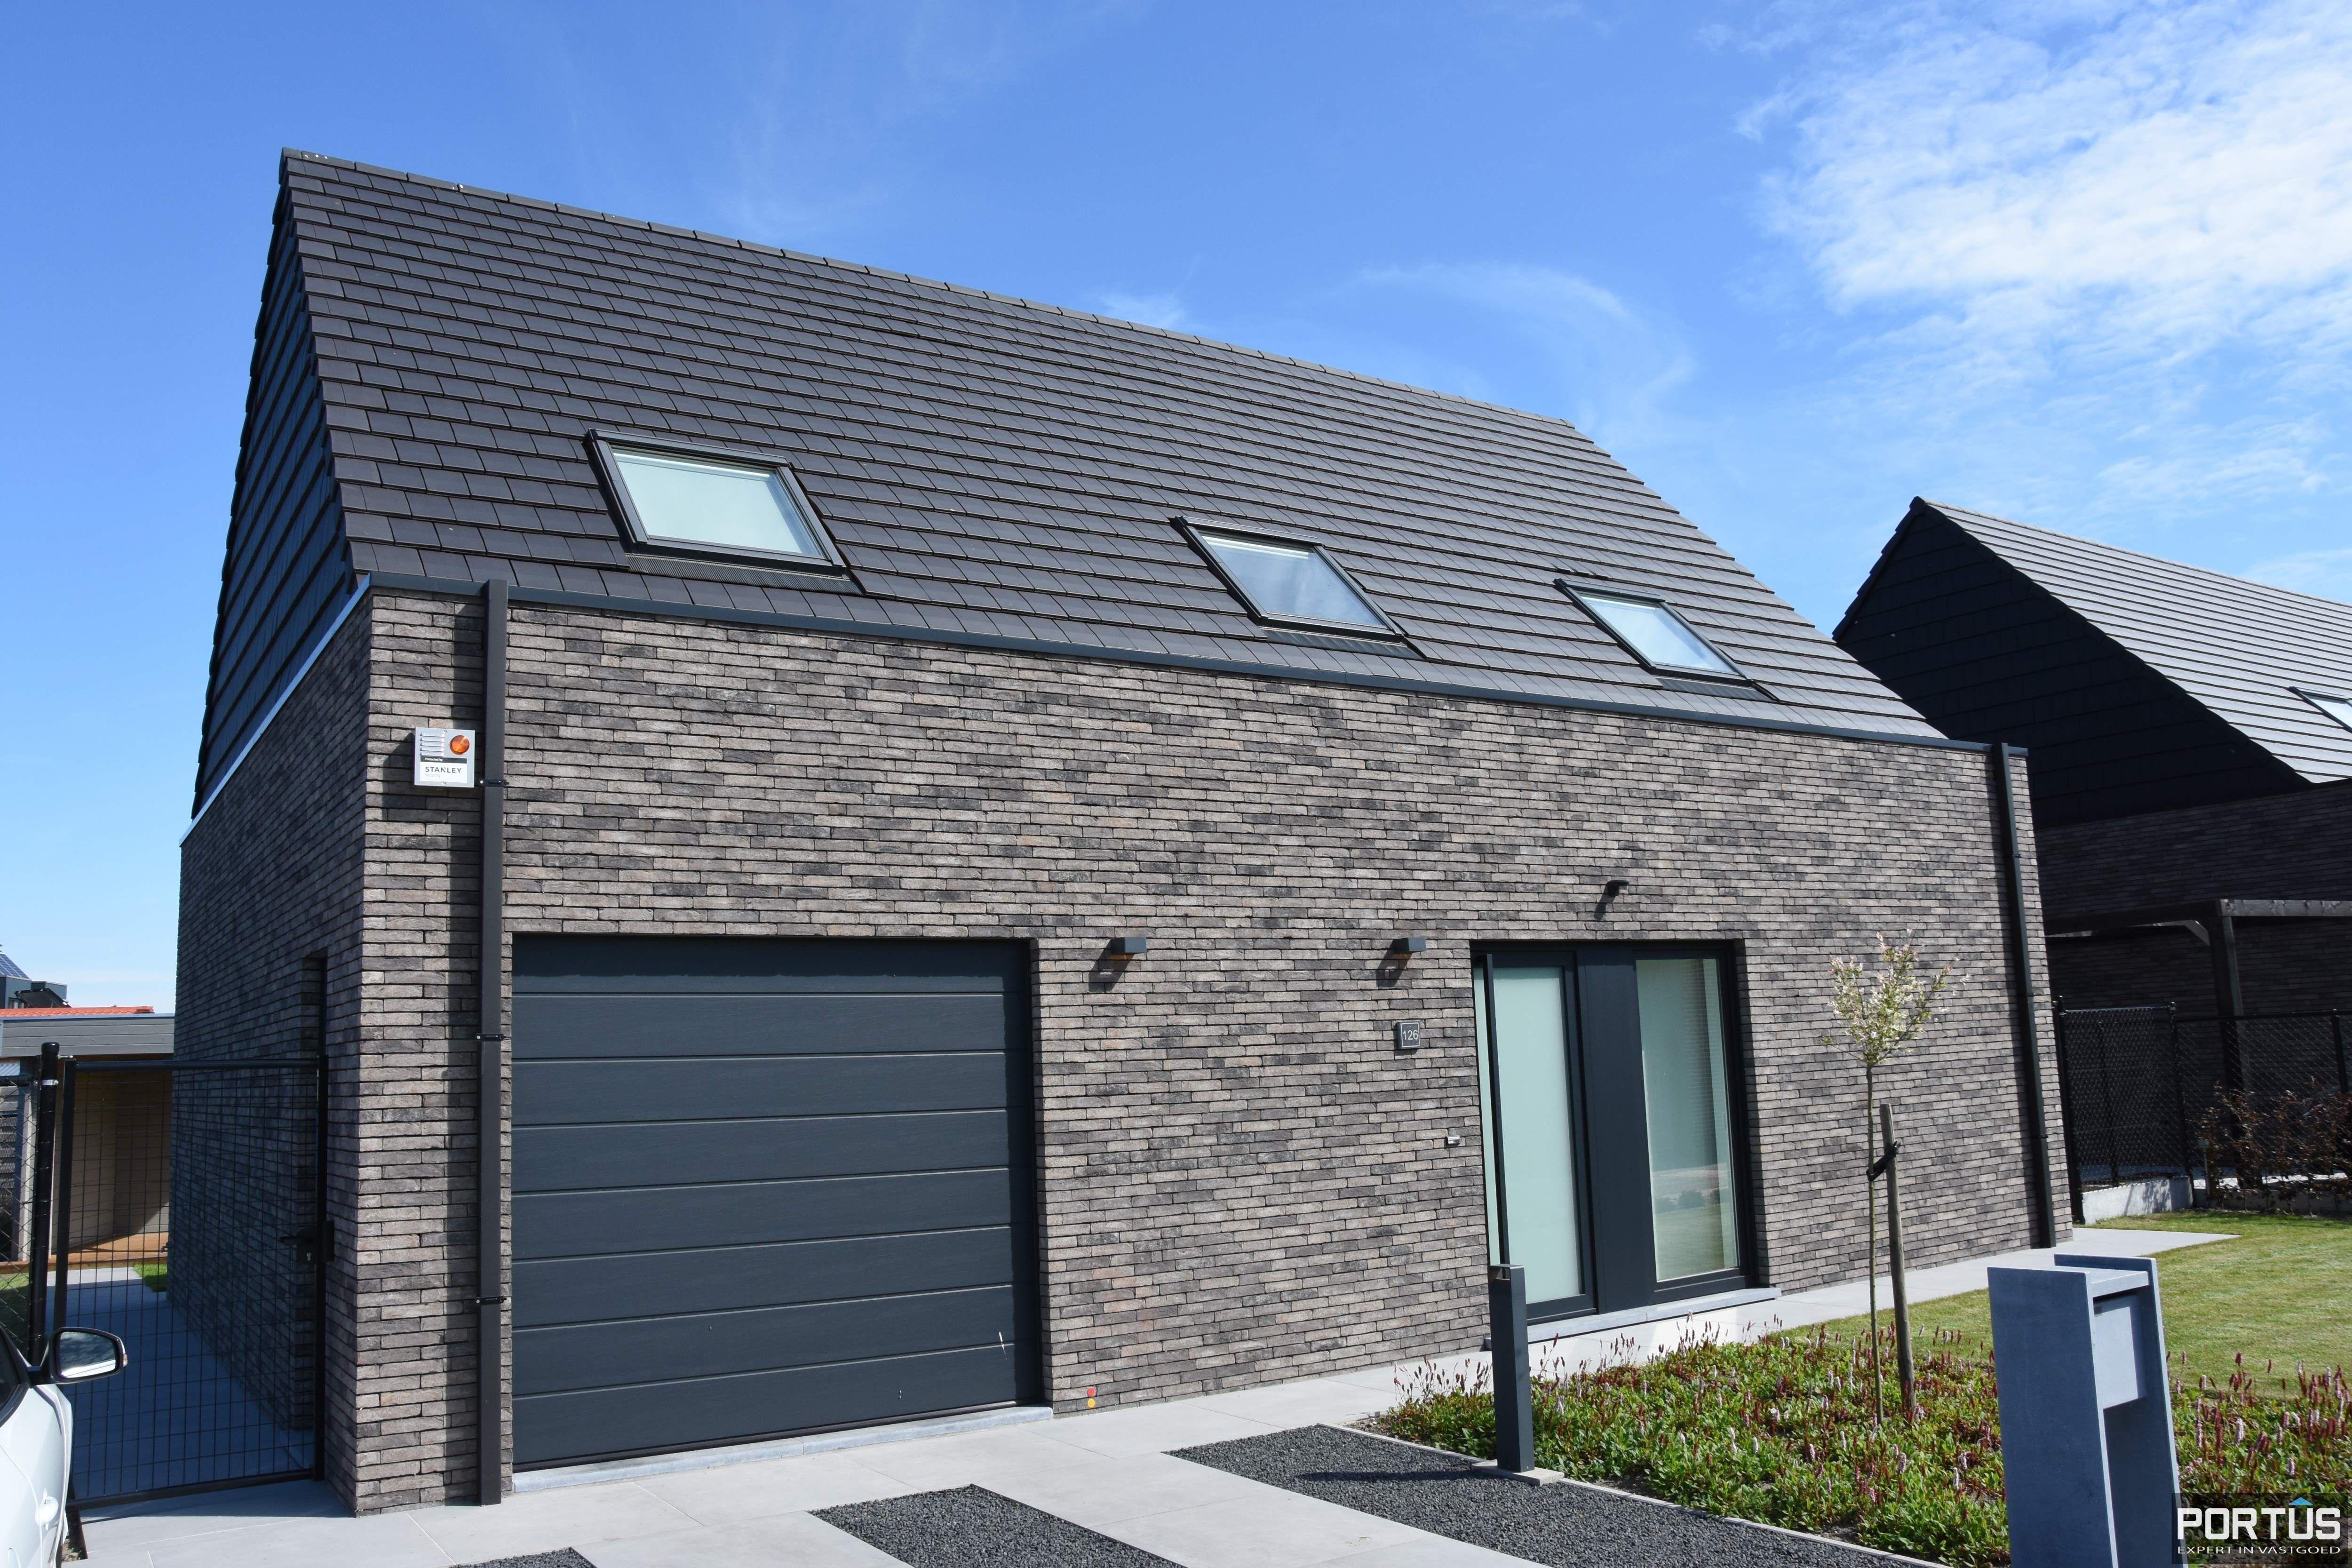 Recente villa te huur met 4 slaapkamers te Westende - 11236